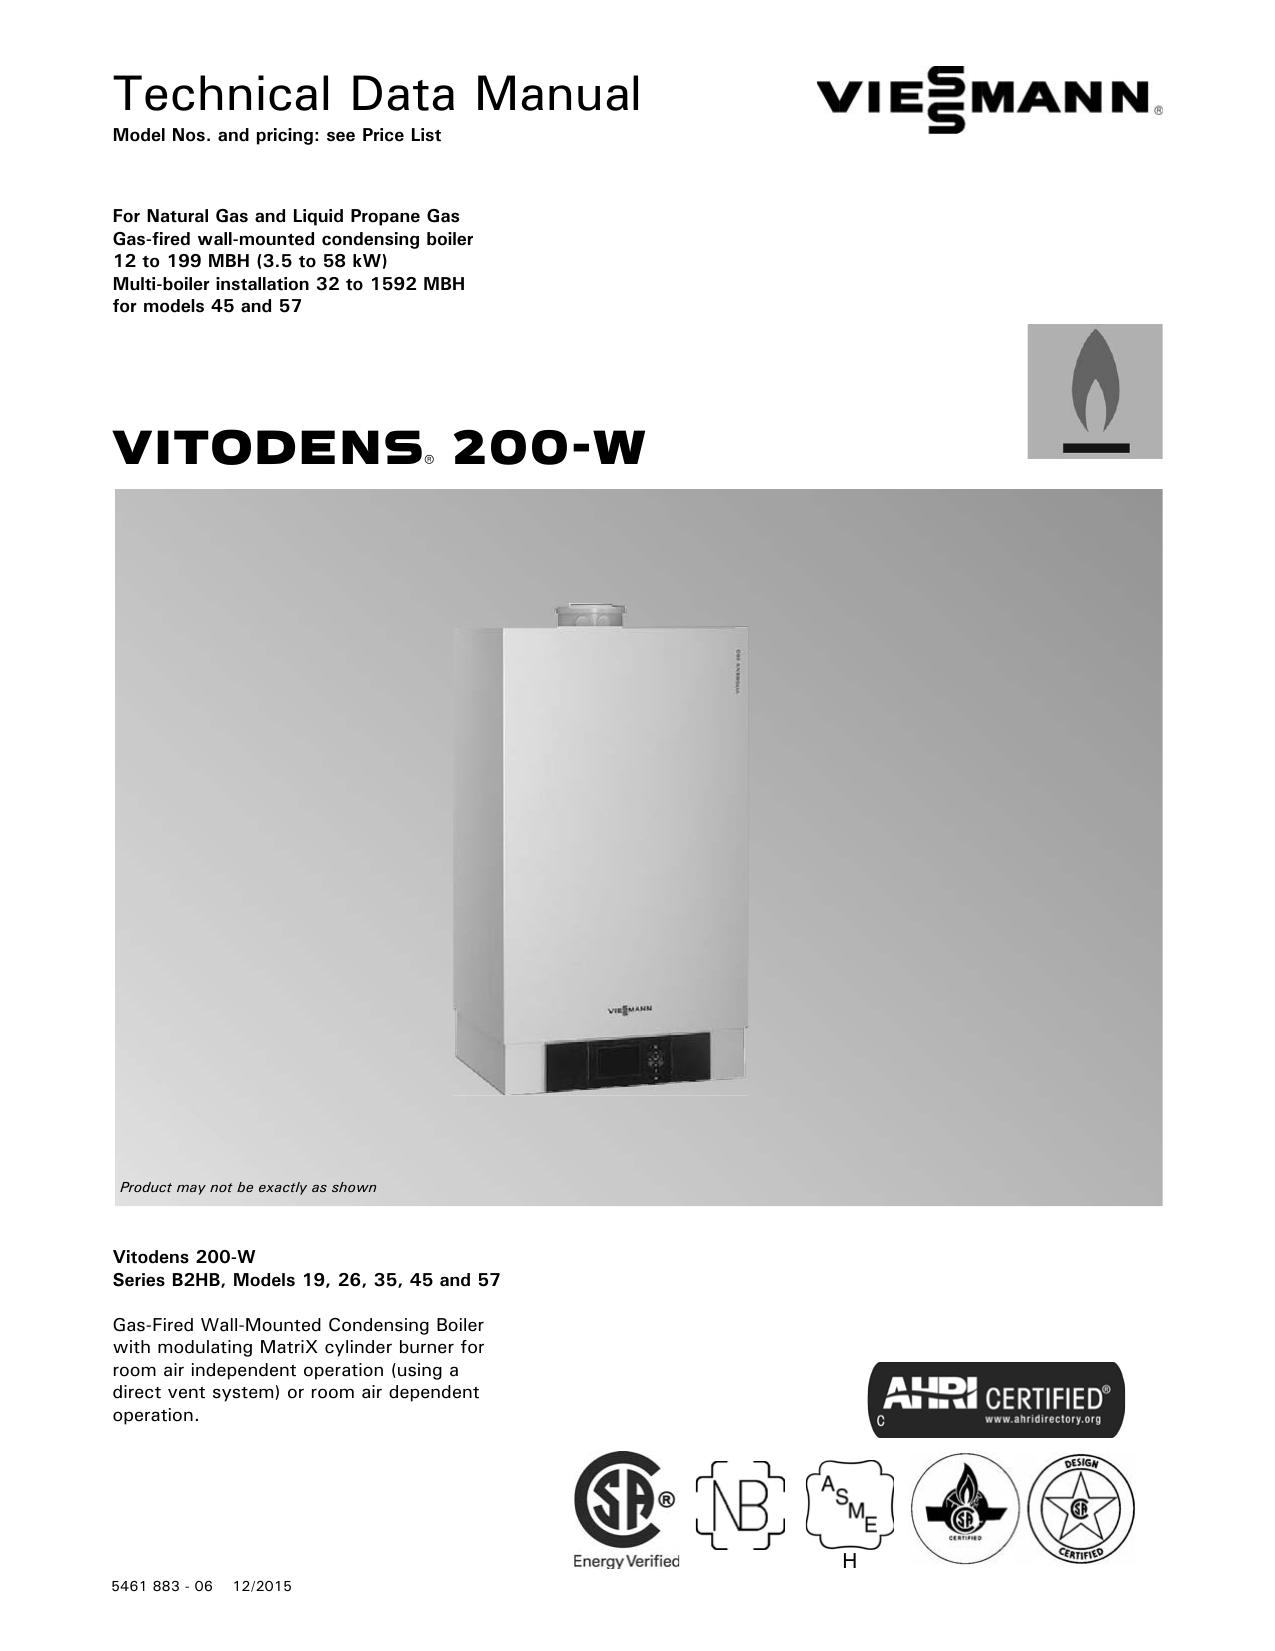 Technical Data Manual B2hb Series Grundfos Boiler Wiring Diagram